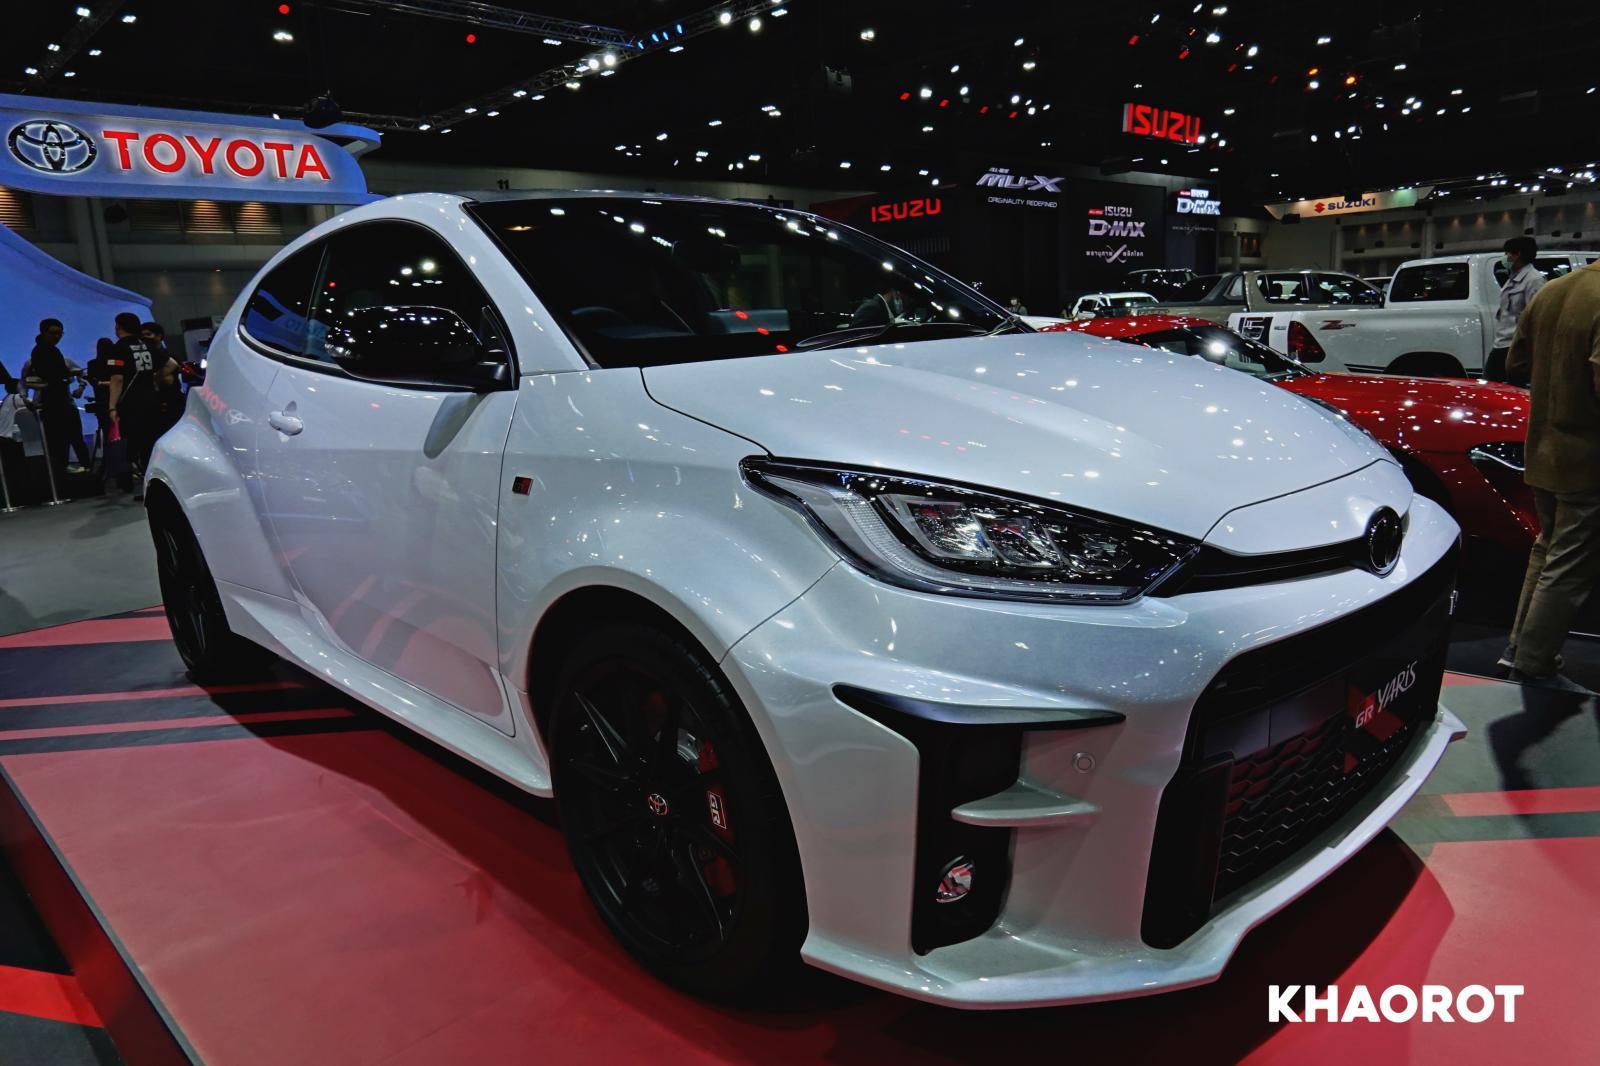 2021 Toyota GR Yaris